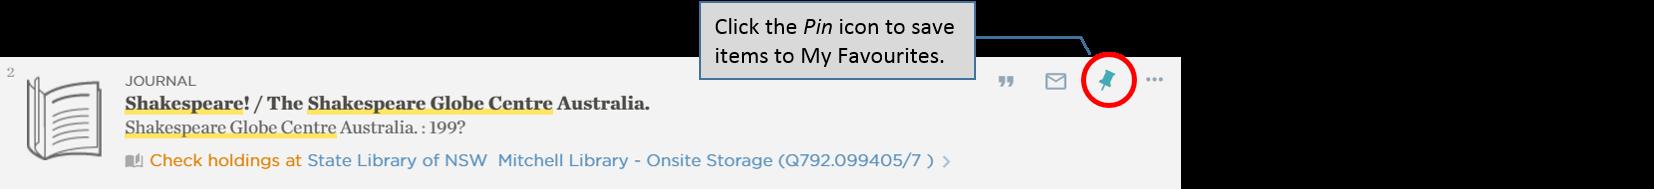 Catalogue – saving items to My Favourites – pin items